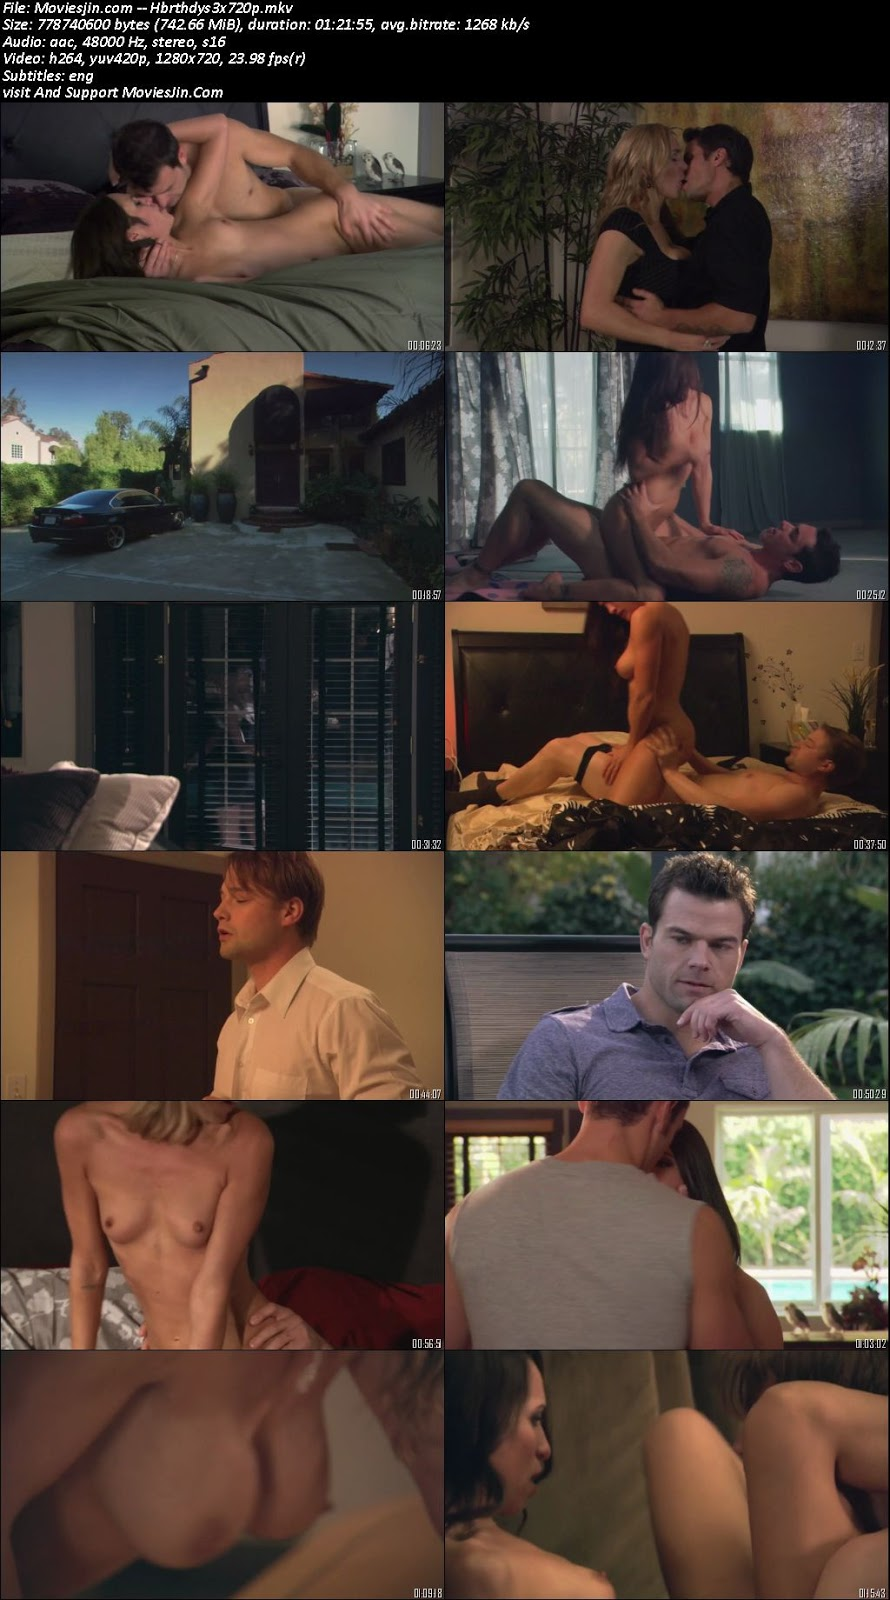 Birthday Sex 2012 Hot Movie 720p WEBDL 700mb